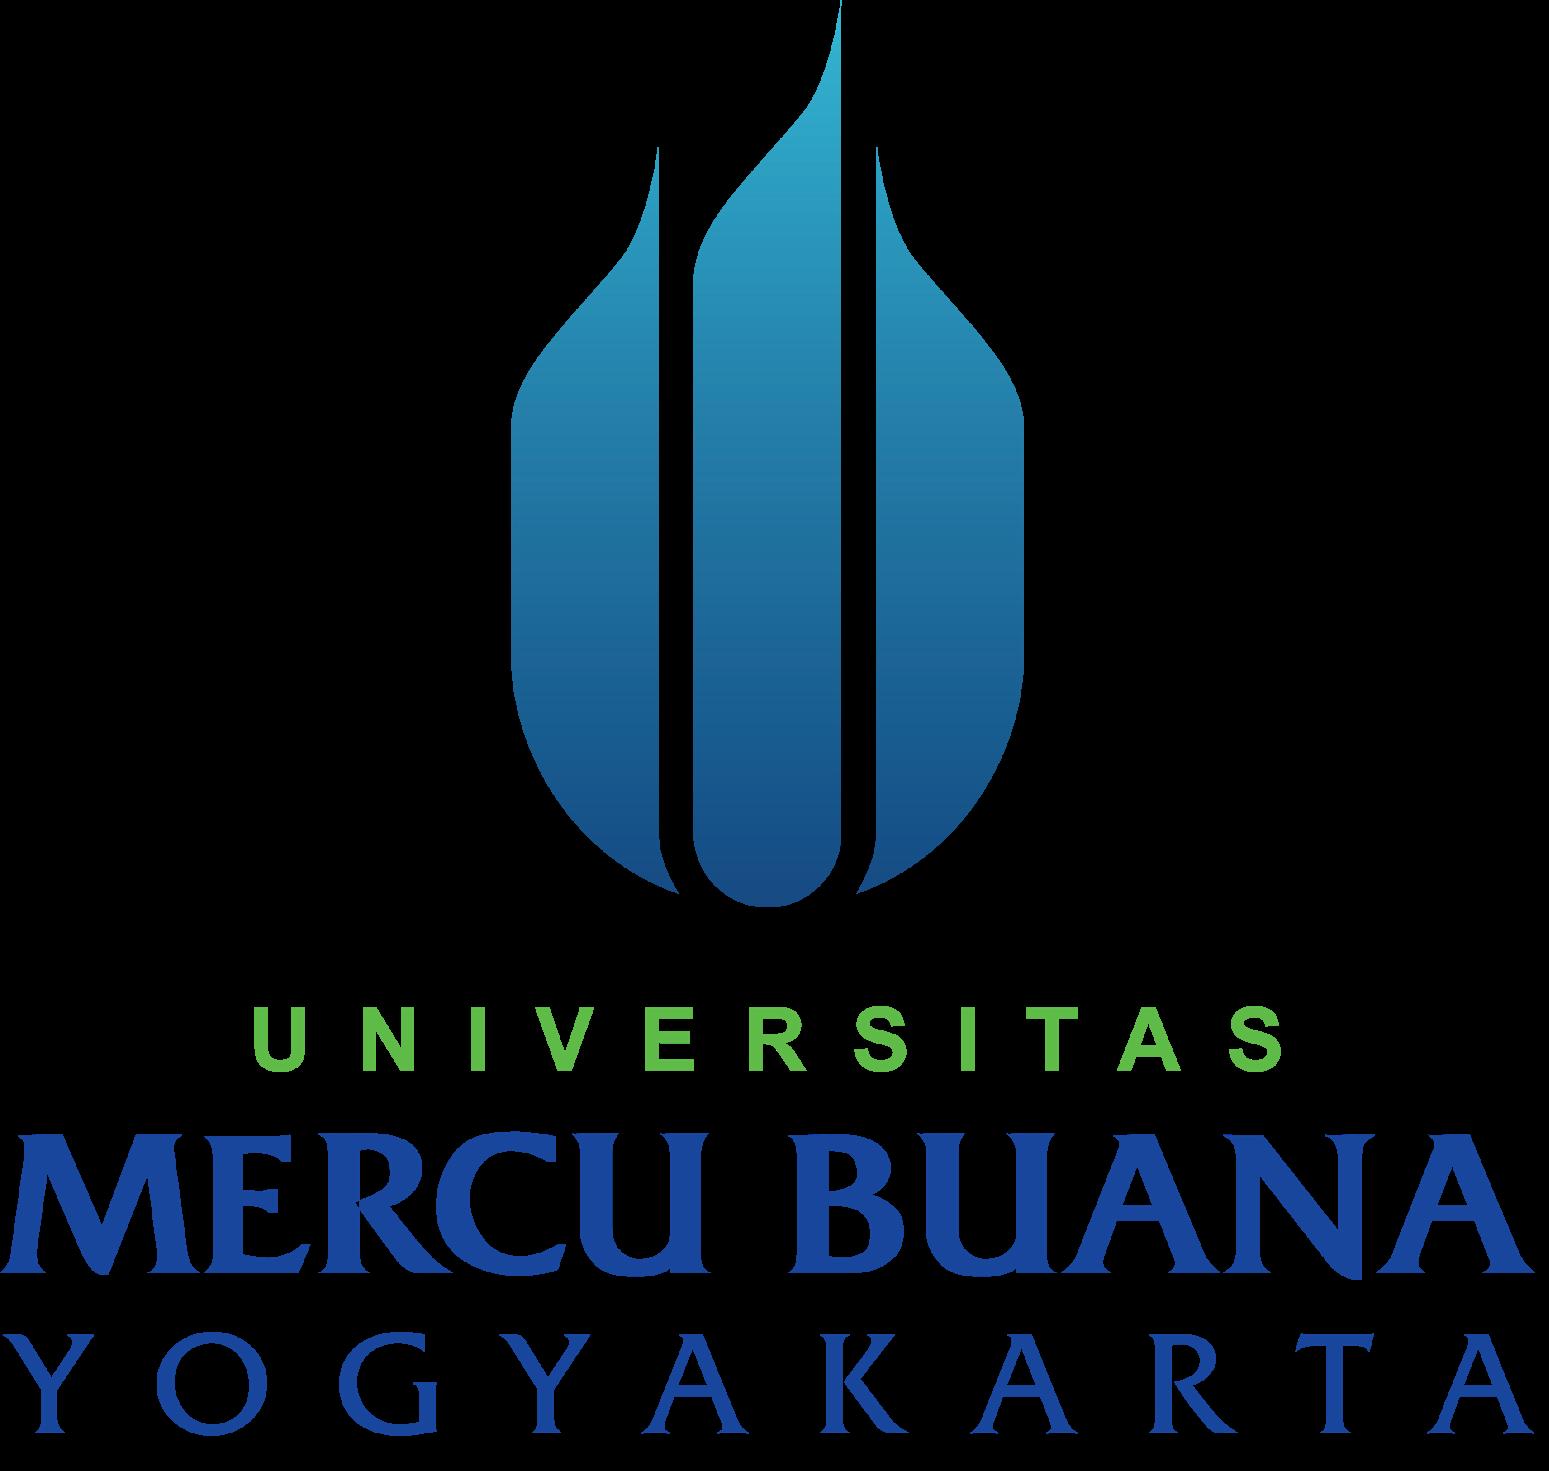 Perpustakaan Universitas Mercubuana Yogyakarta